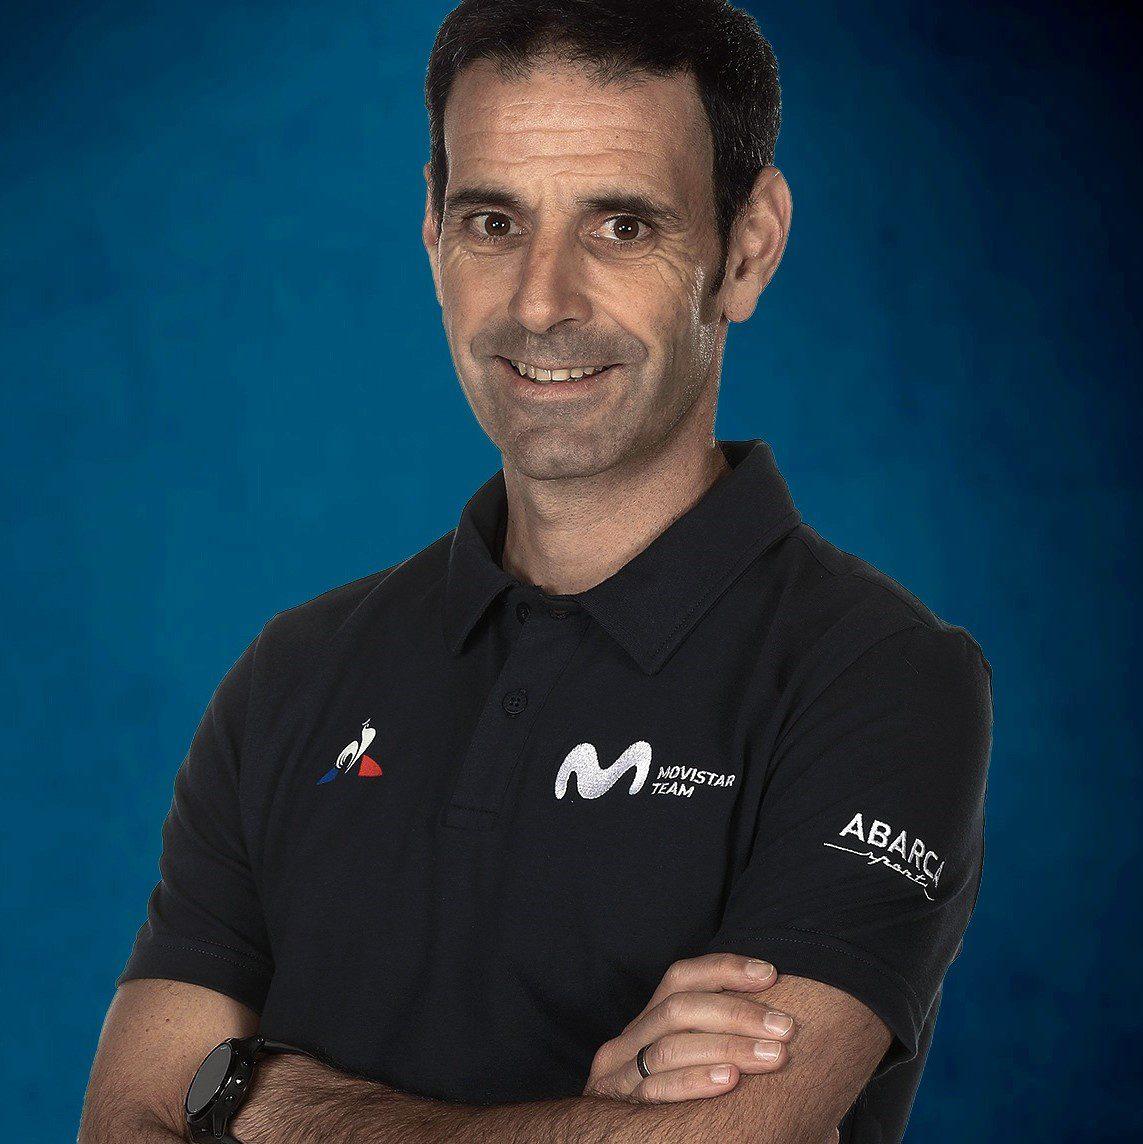 Patxi Vila Head of performance Movistar Team